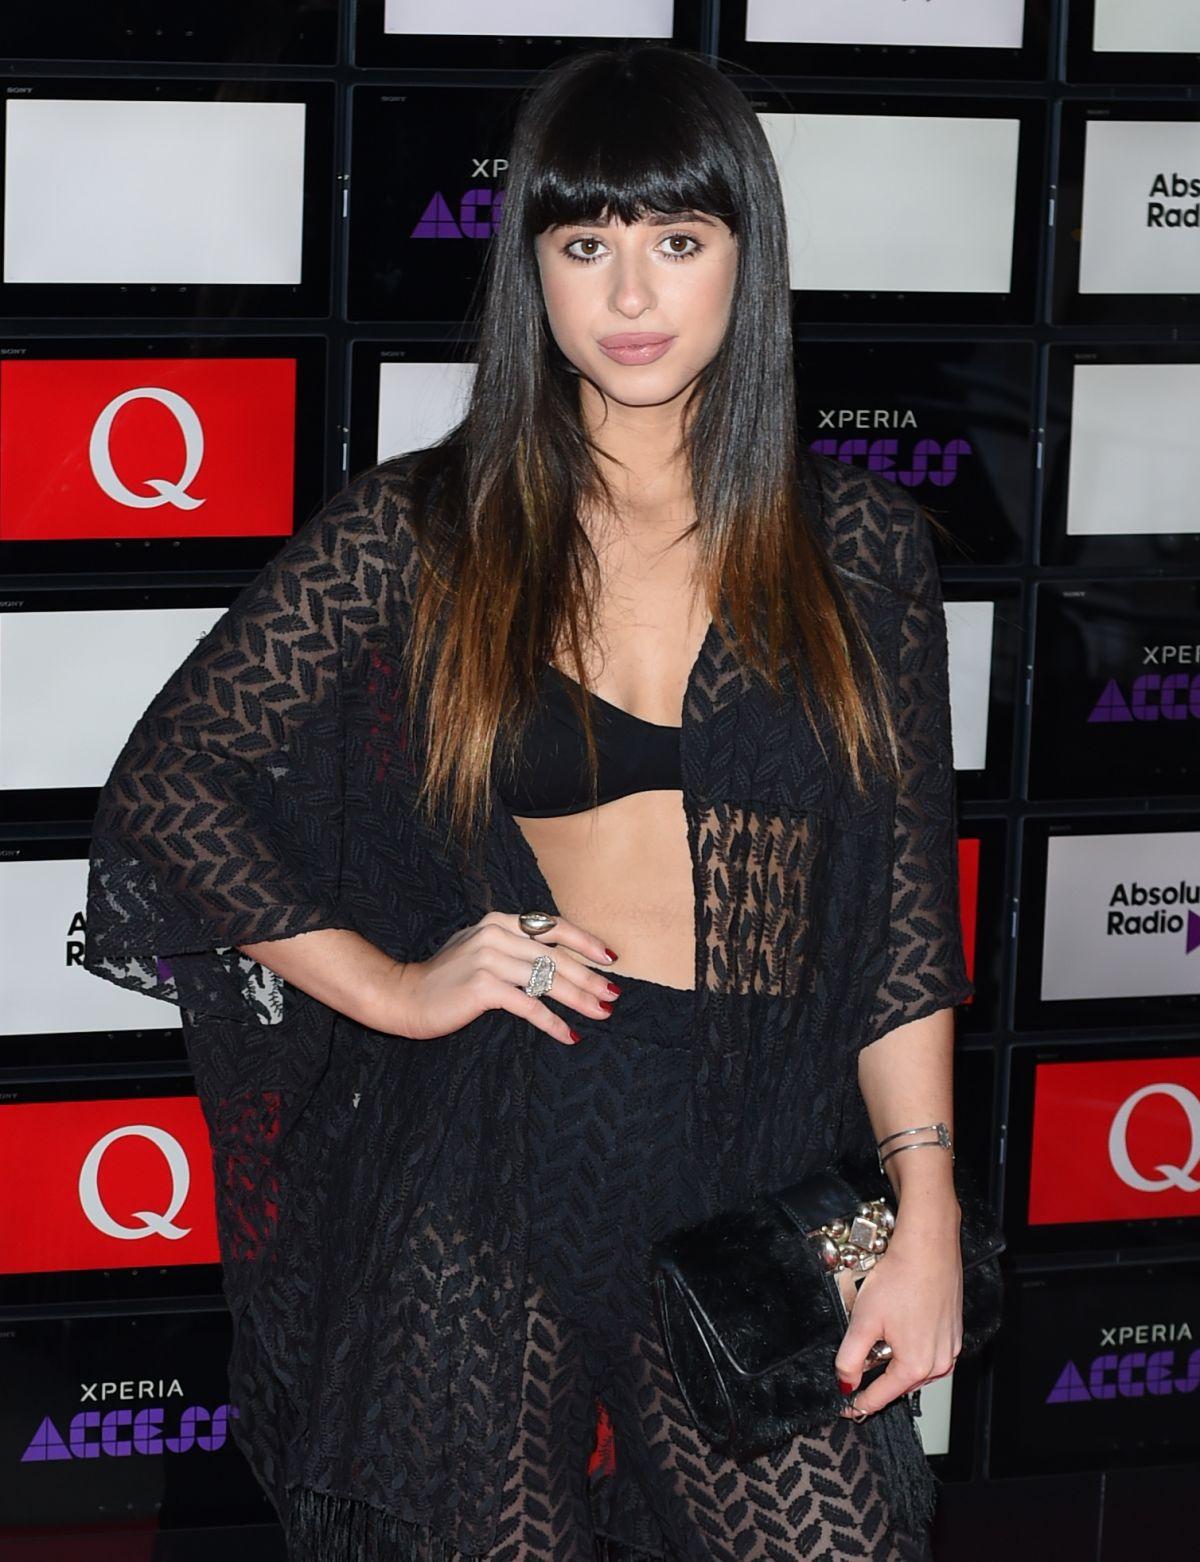 LOUISA ROSE ALEN at Xperia Access Q Awards in London